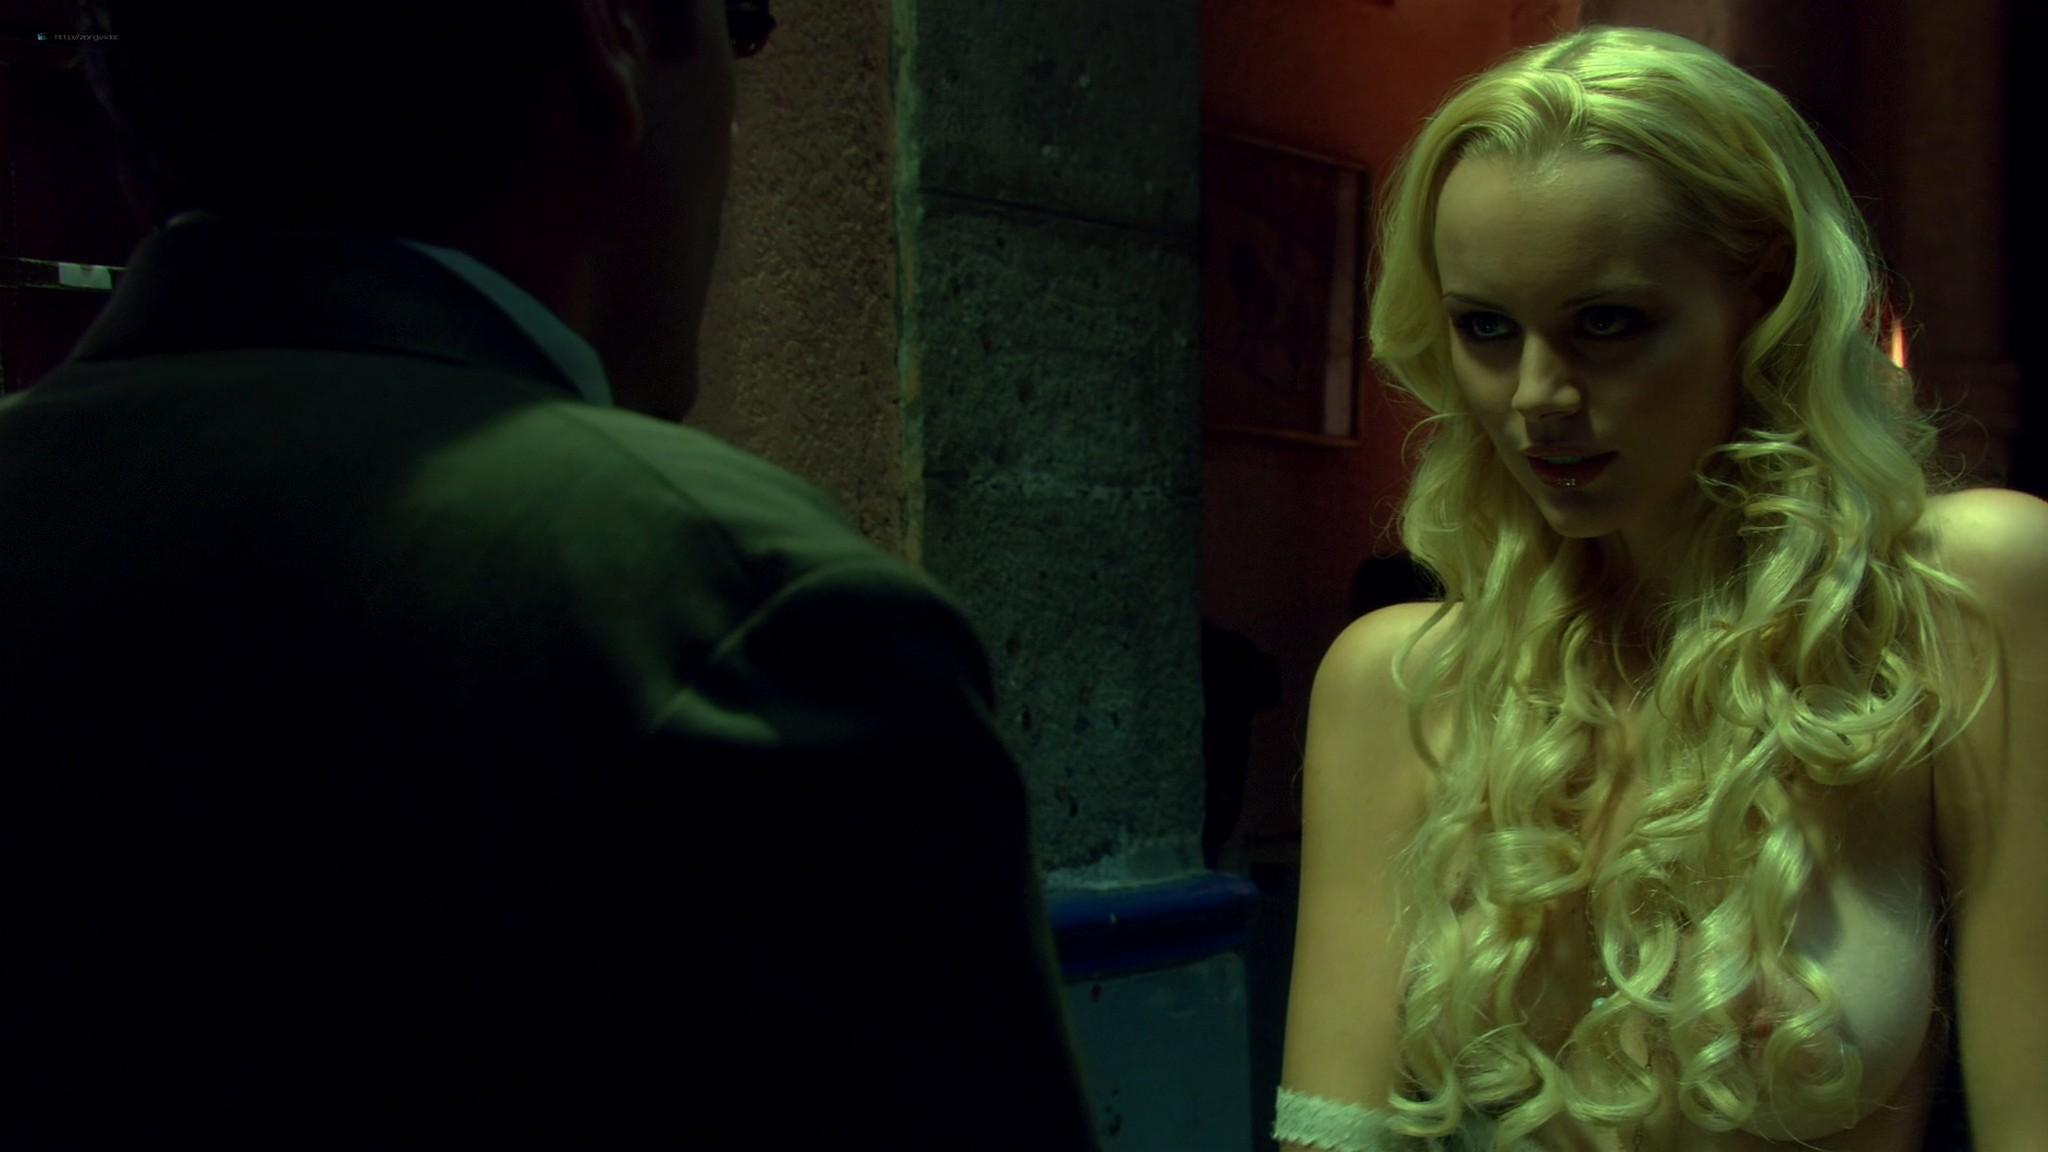 Helena Mattsson nude full frontal and Marlene Favela nude Species The Awakening 2007 HD 1080p BluRay REMUX 011